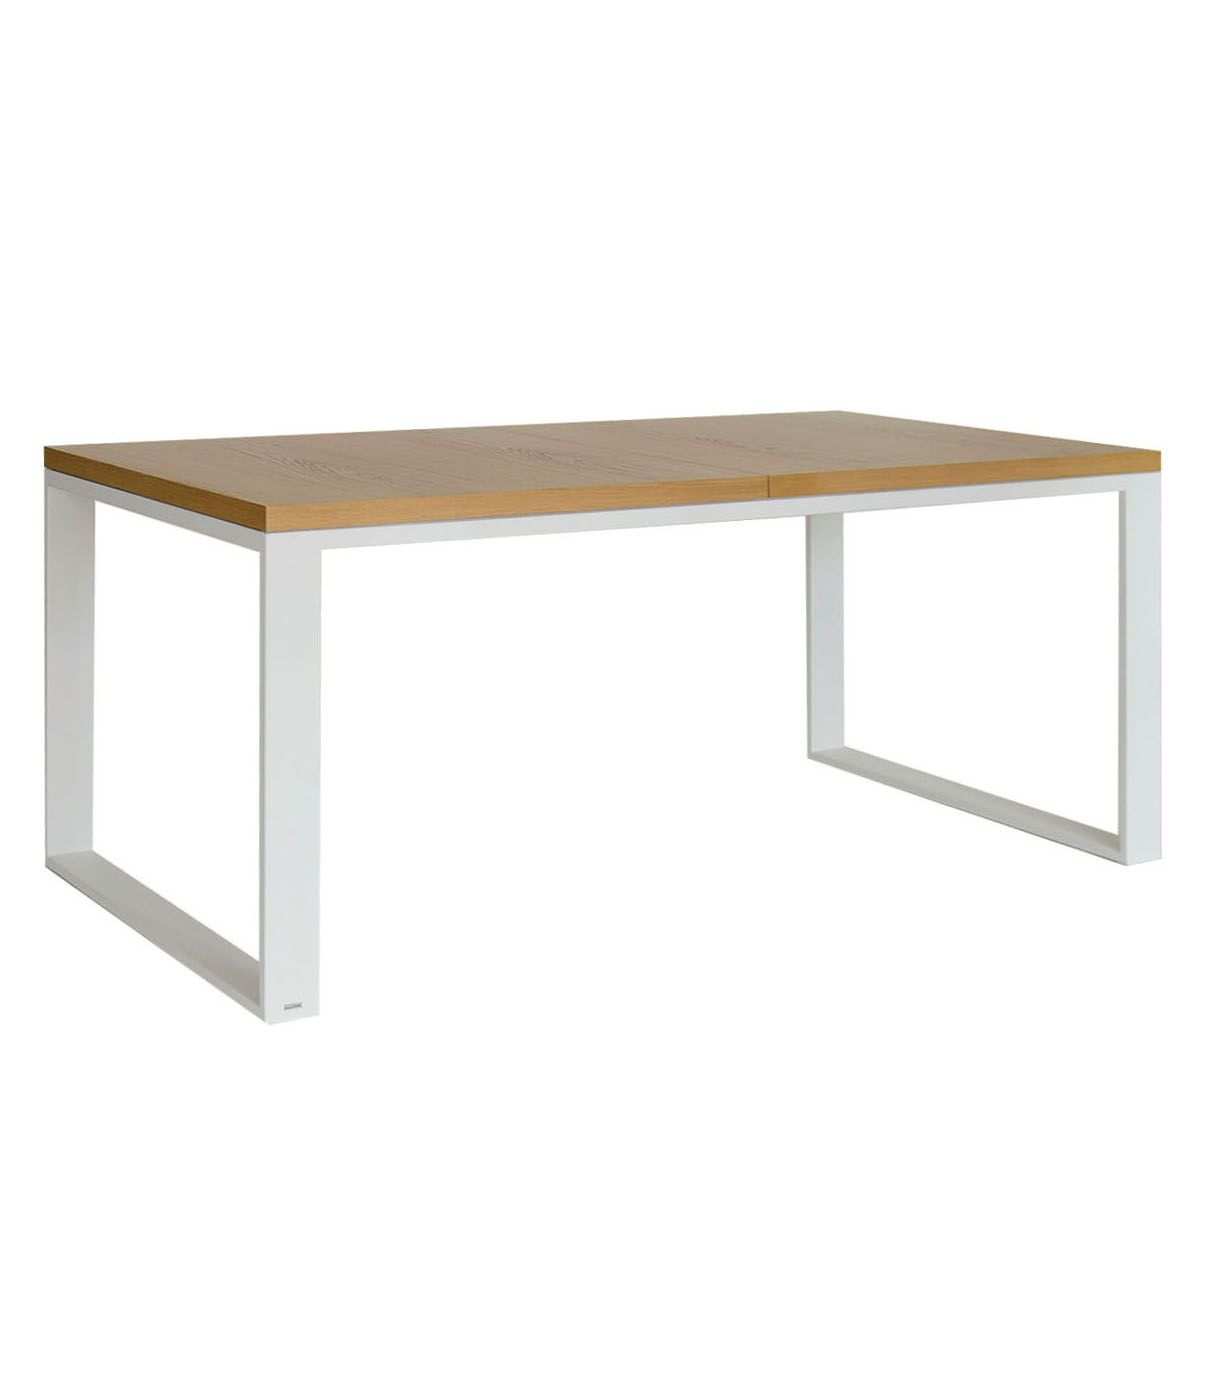 loftowy stół rozkładany orlando - take me HOME